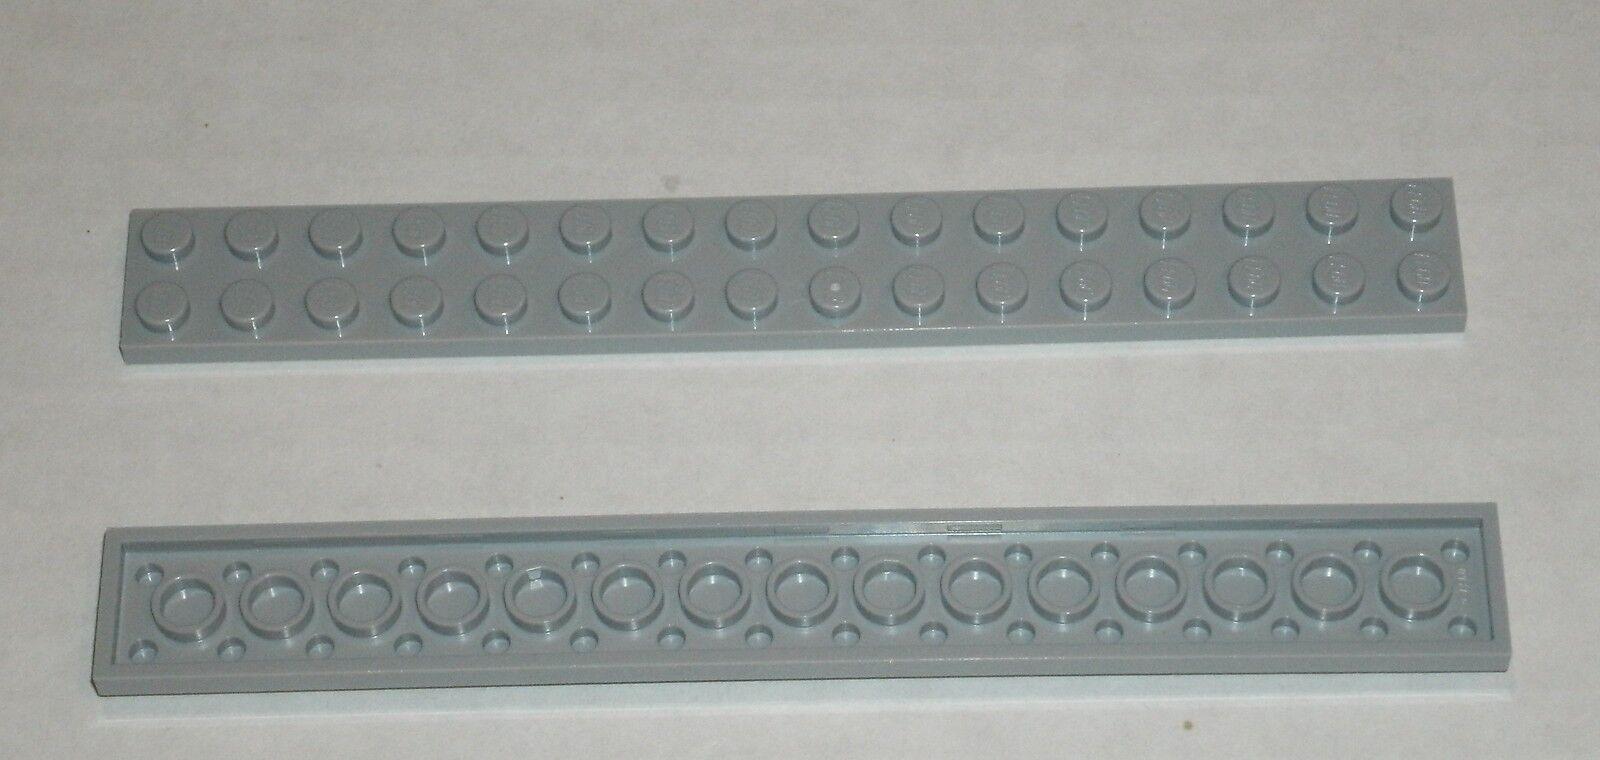 LEGO New Lot of 8 Light Bluish Gray 1x1 Plates with Horiztonal Clip